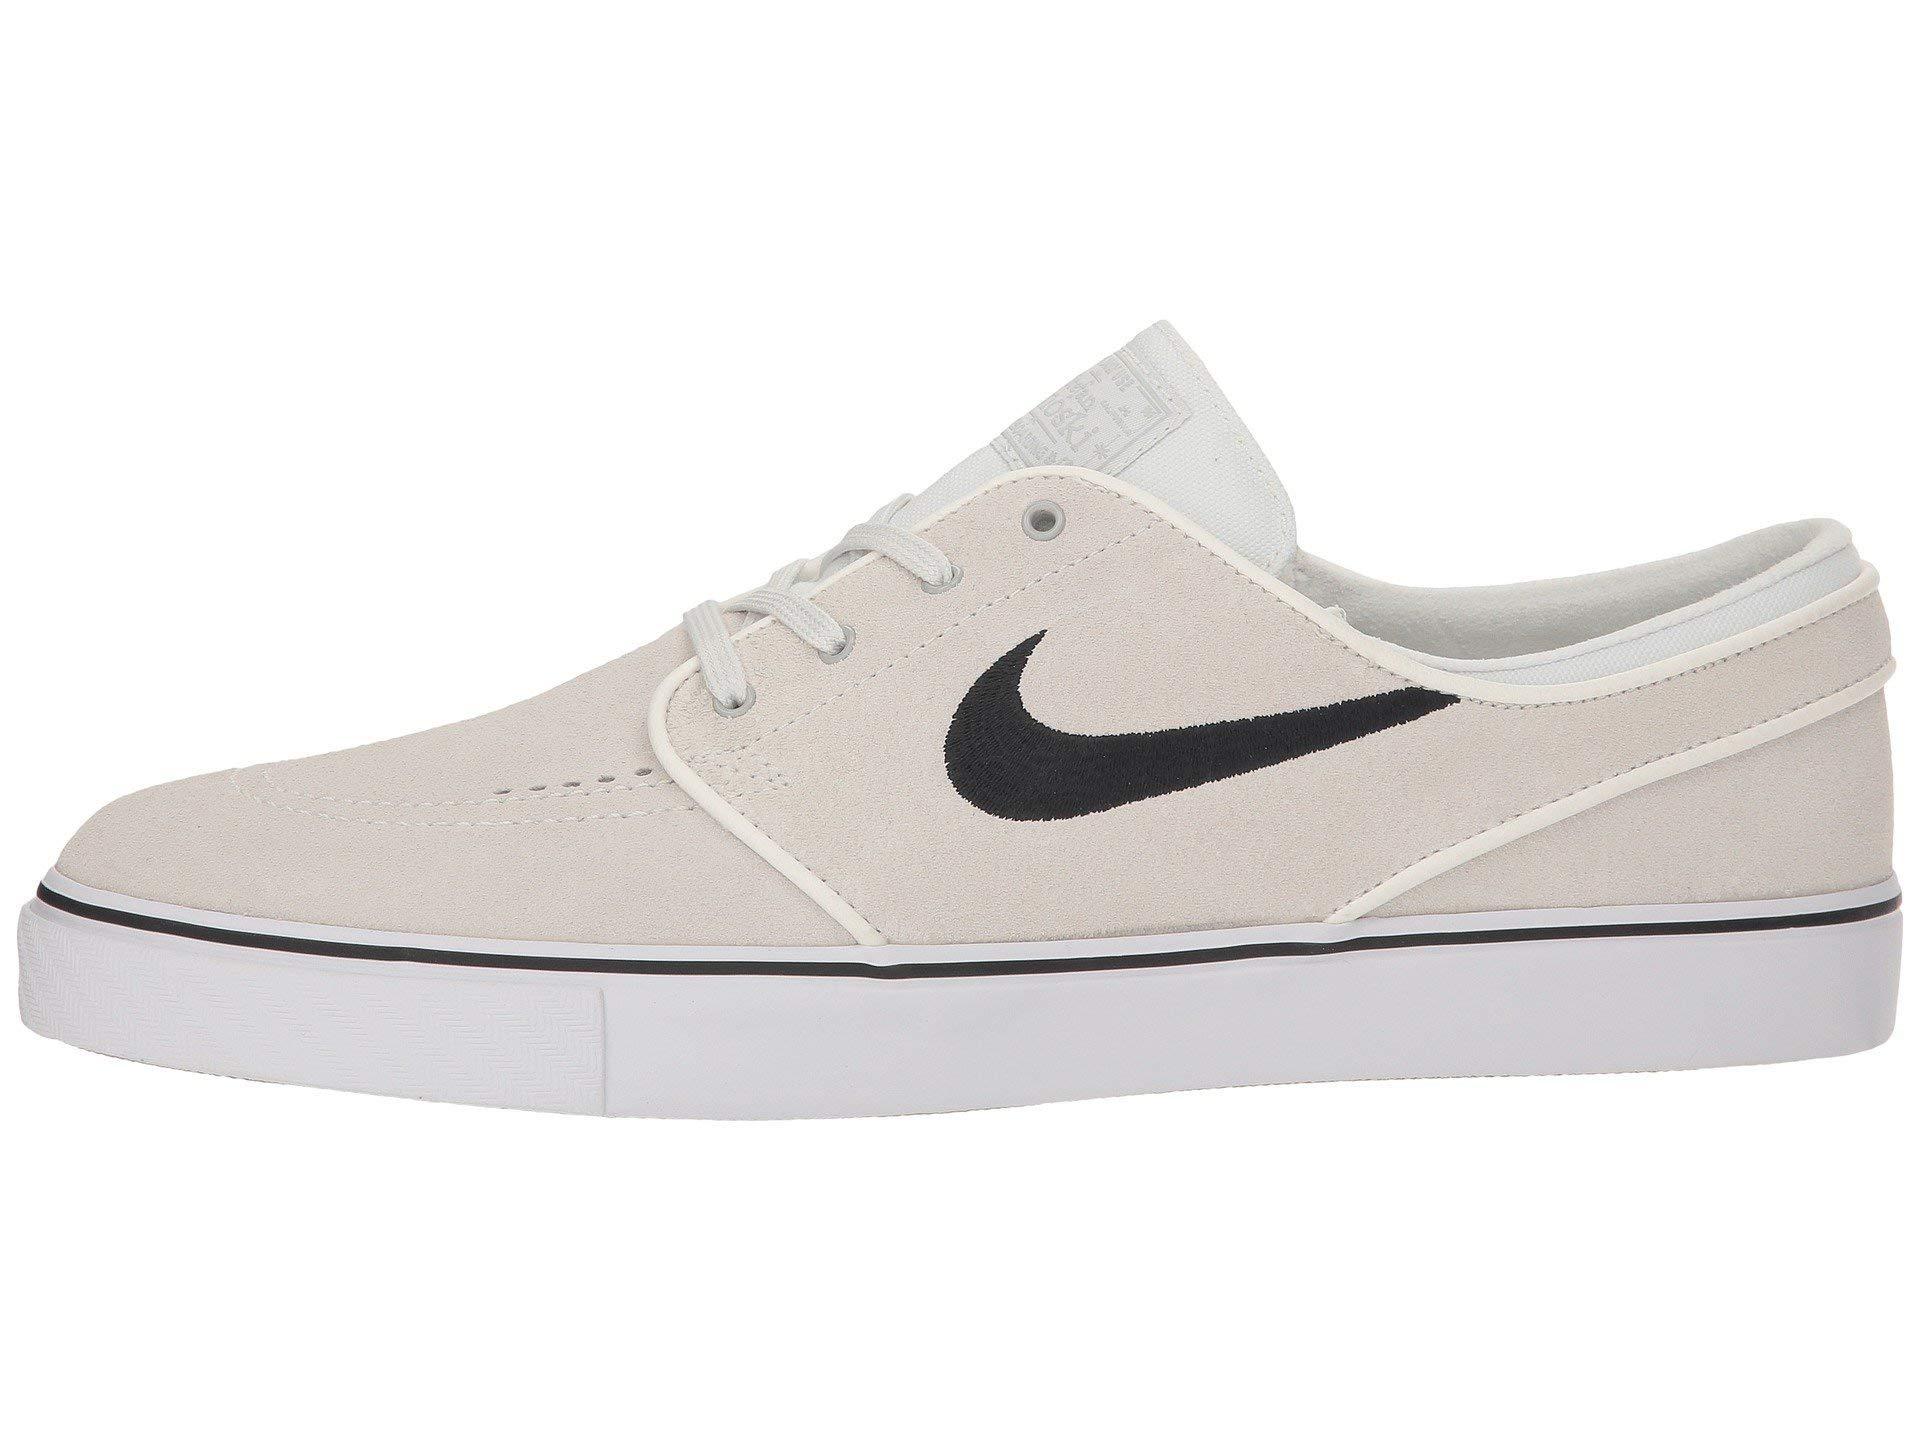 buy popular separation shoes authorized site NIKE Zoom Stefan Janoski Men's Skateboarding Shoe (10 D(M) US) on ...